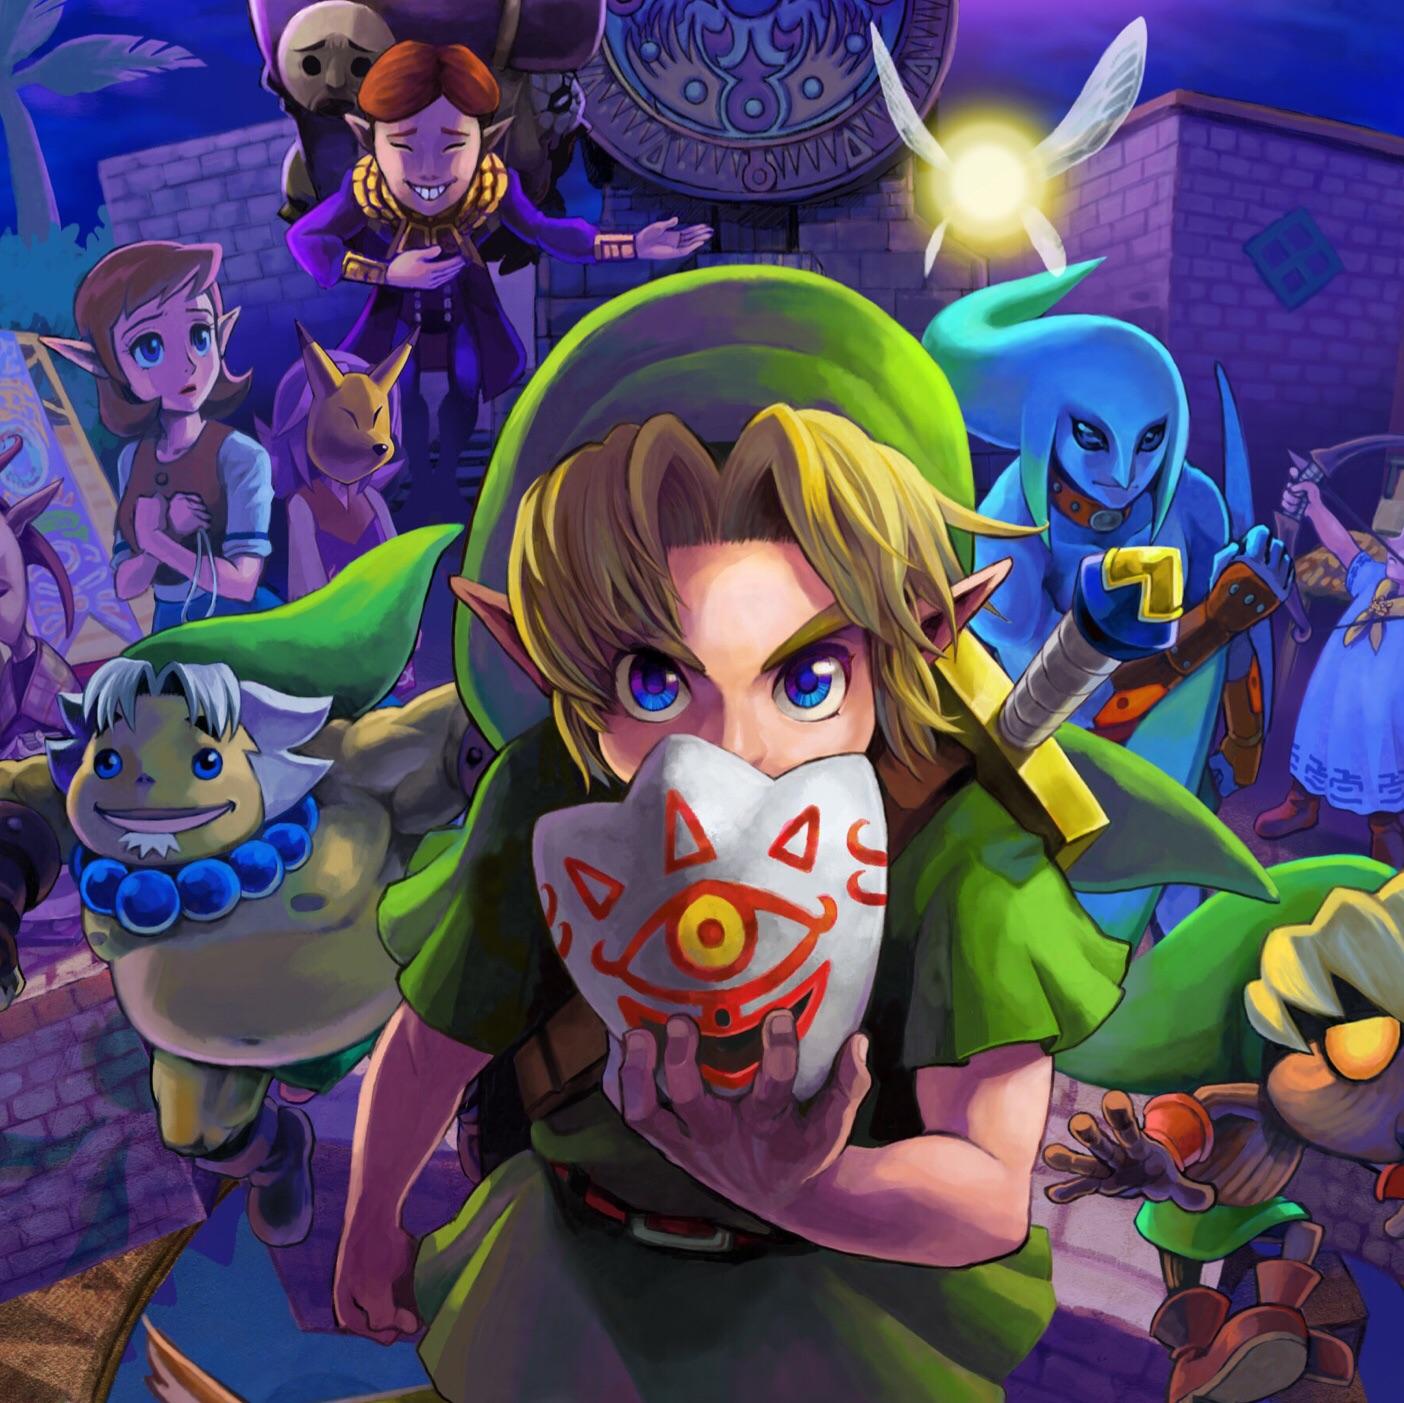 Top tips to get a head start in The Legend of Zelda: Majora's Mask 3D